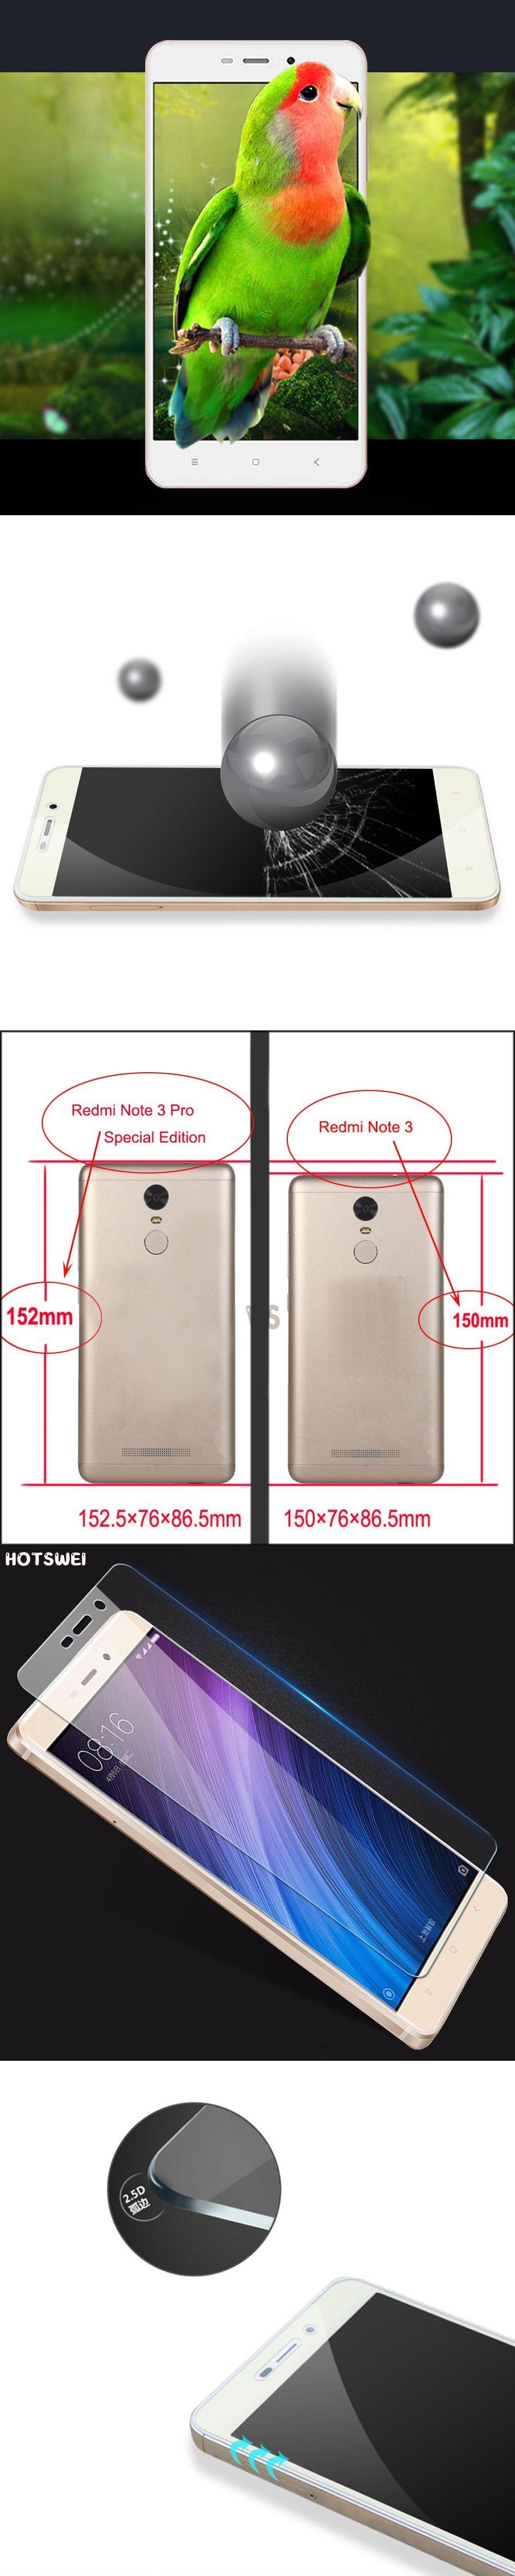 0 26mm 9H Tempered Glass for Xiaomi Redmi 3 3s pro Mi 5 Mi4 Mi4C 4i